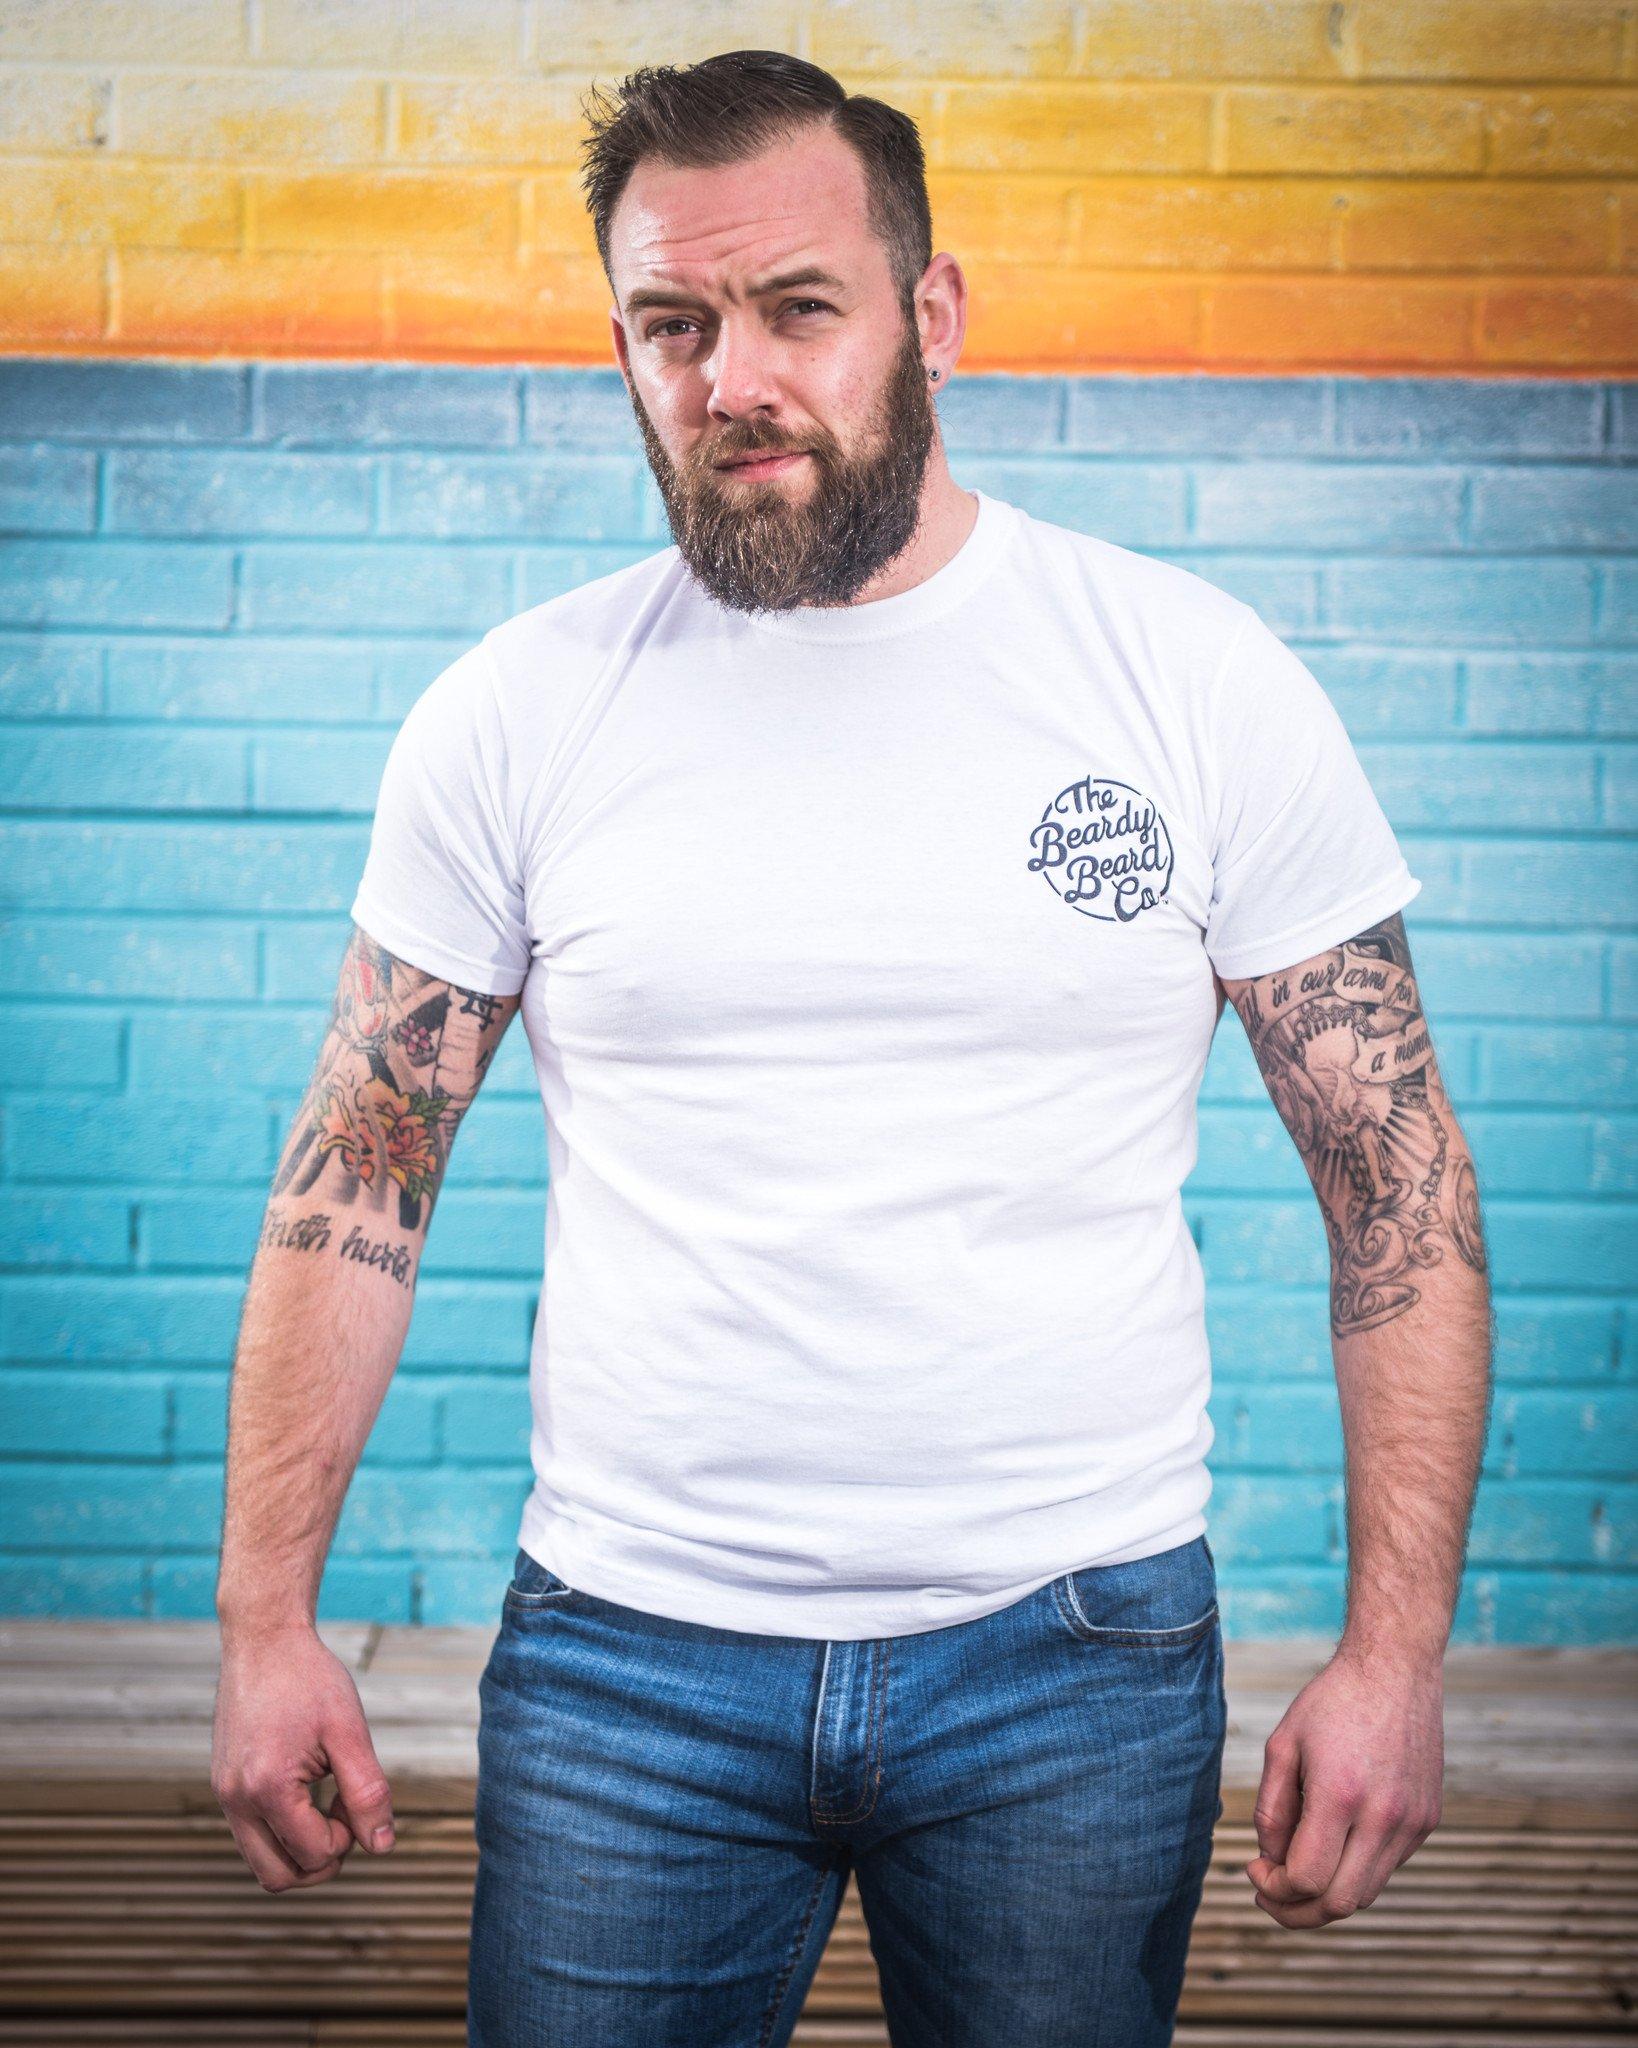 The beardy Beard Co Tee